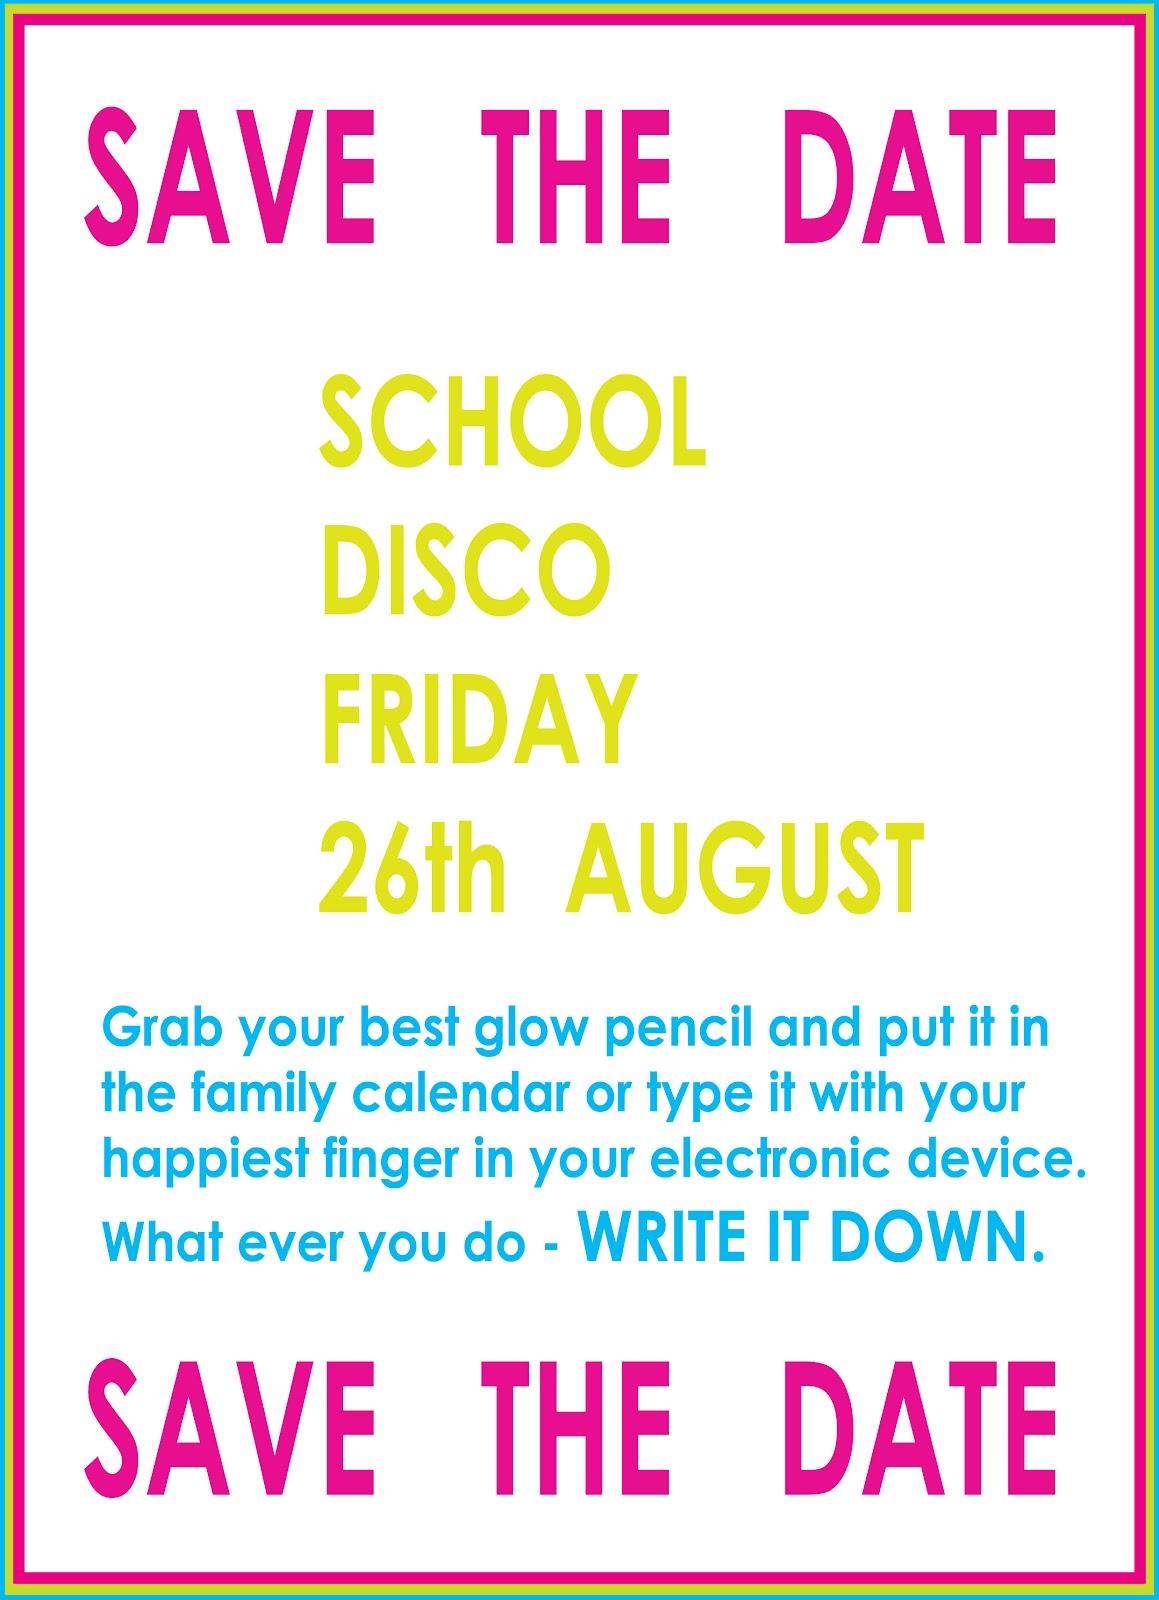 save the date Disco 2016.jpg